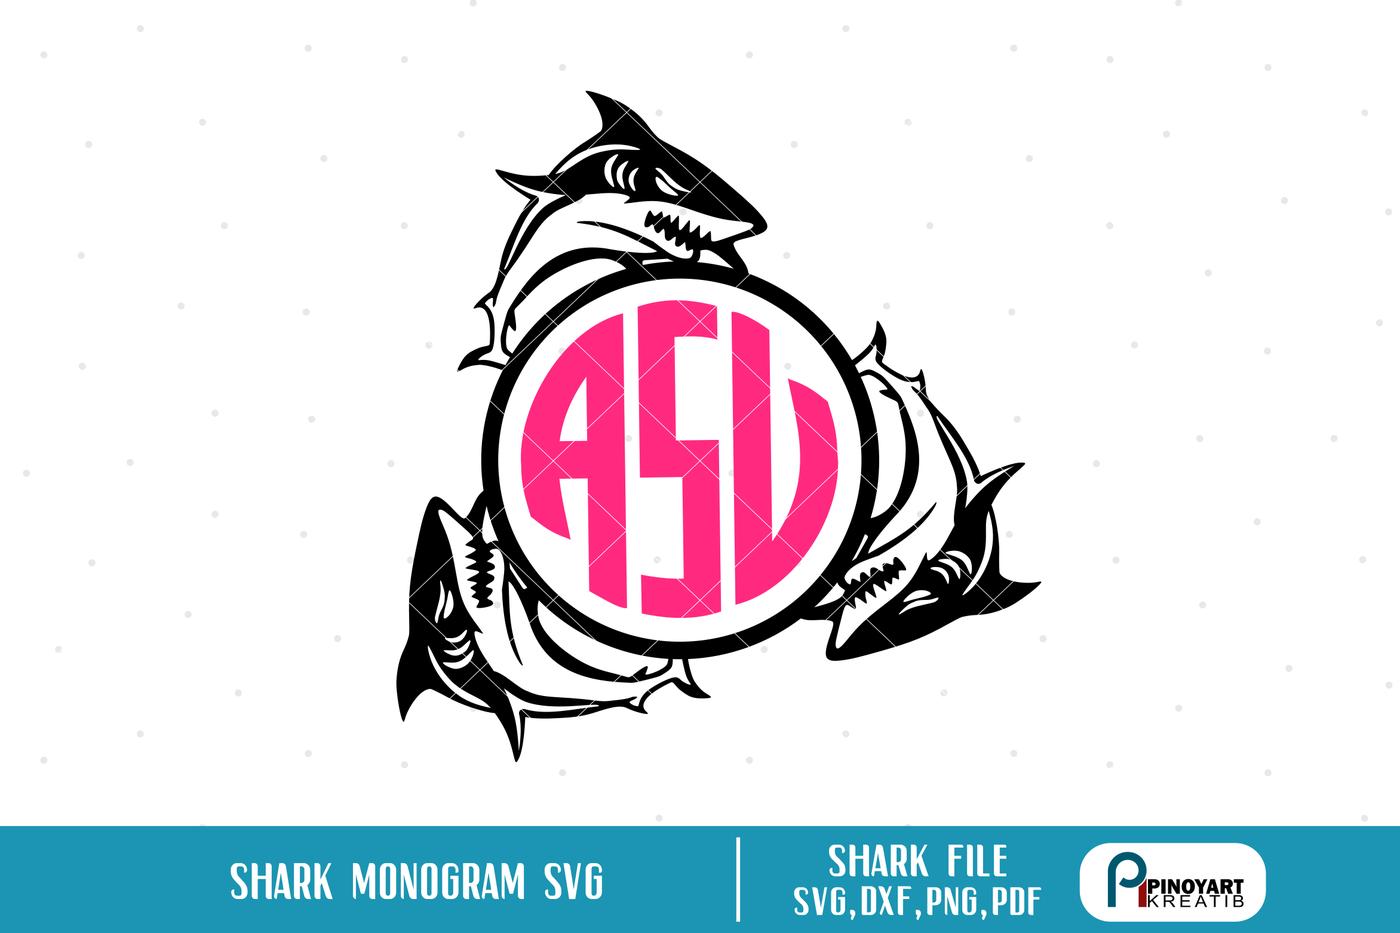 Shark Monogram Svg Shark Svg Shark Svg File Shark Monogram Dxf